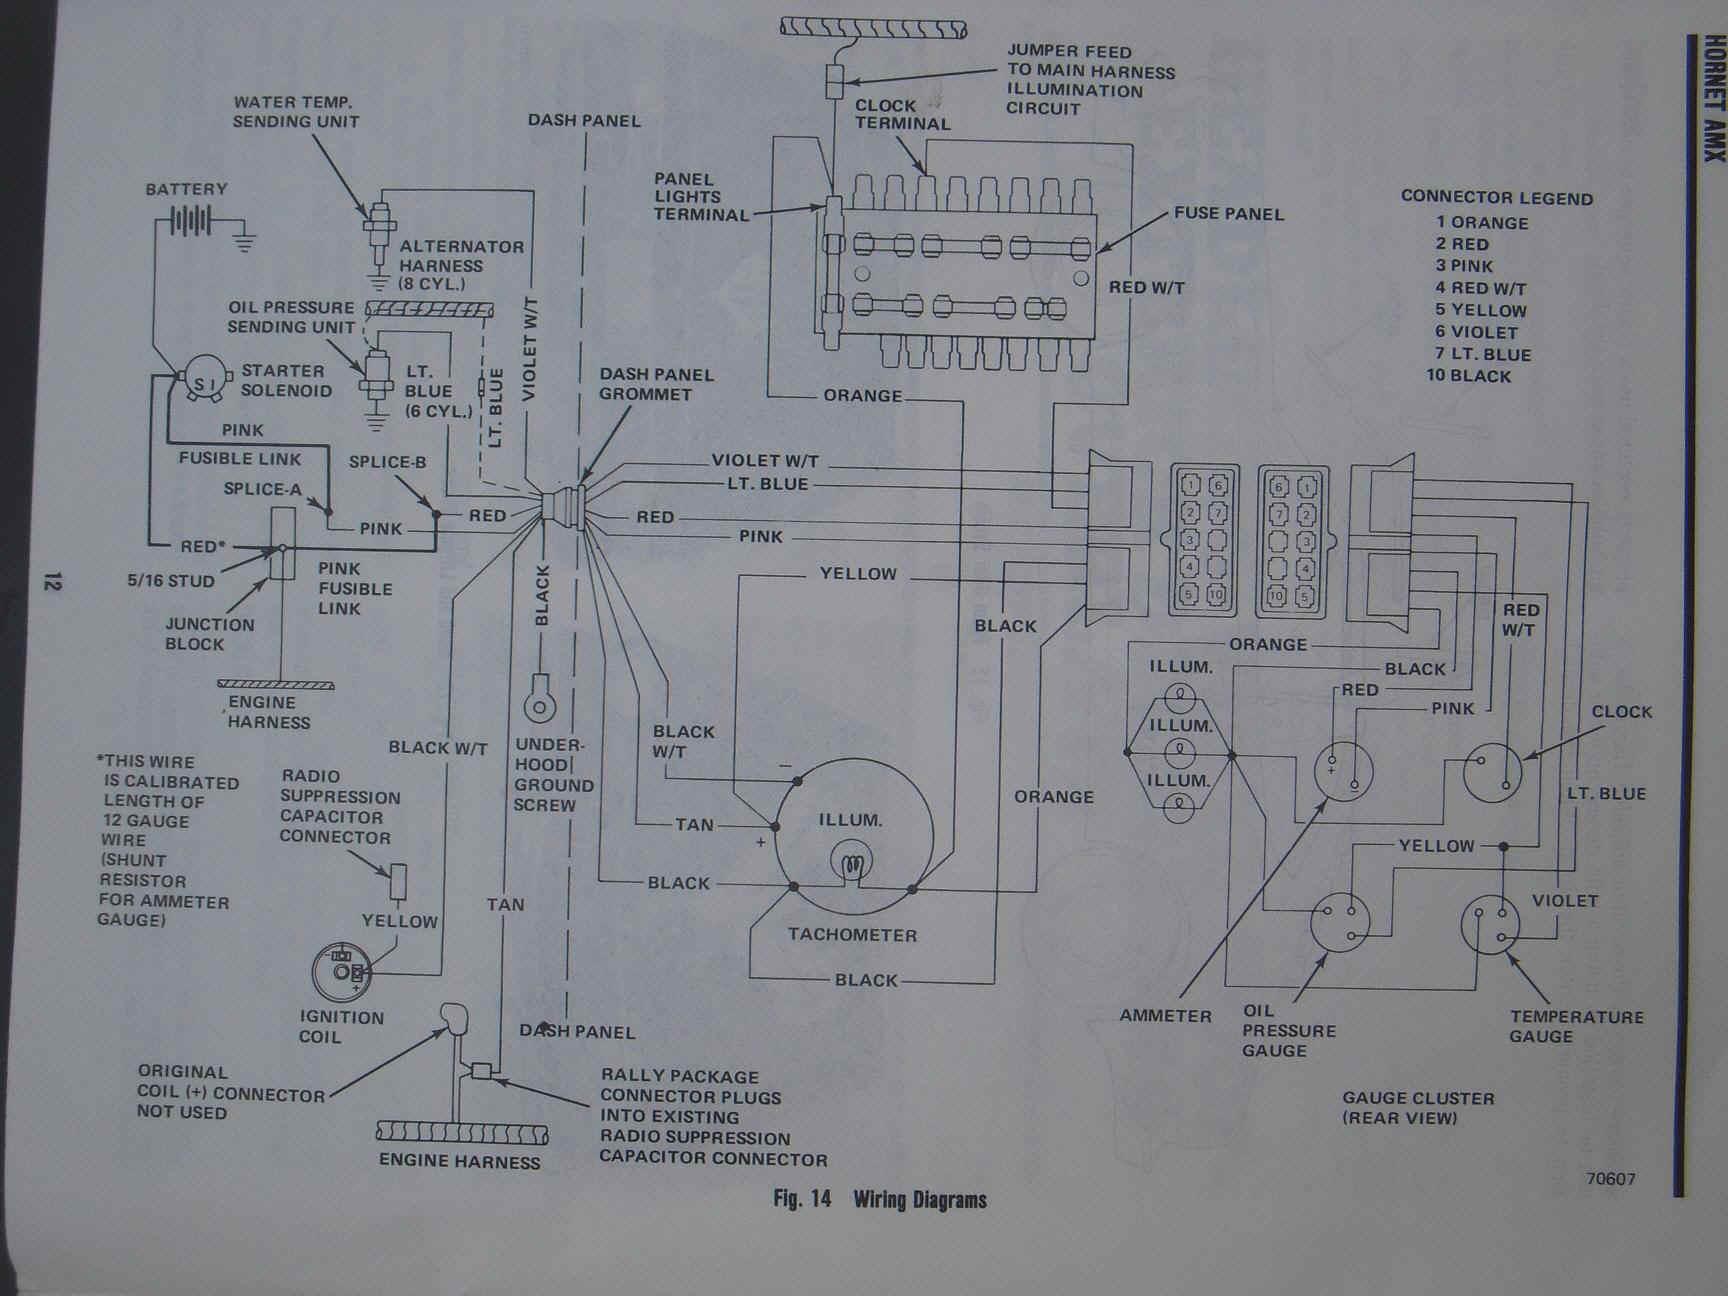 Amc Wiring Harness Diagram 2014 chevy silverado light bulb ... on amx parts, amx speedometer, amx headlight, amx engine,